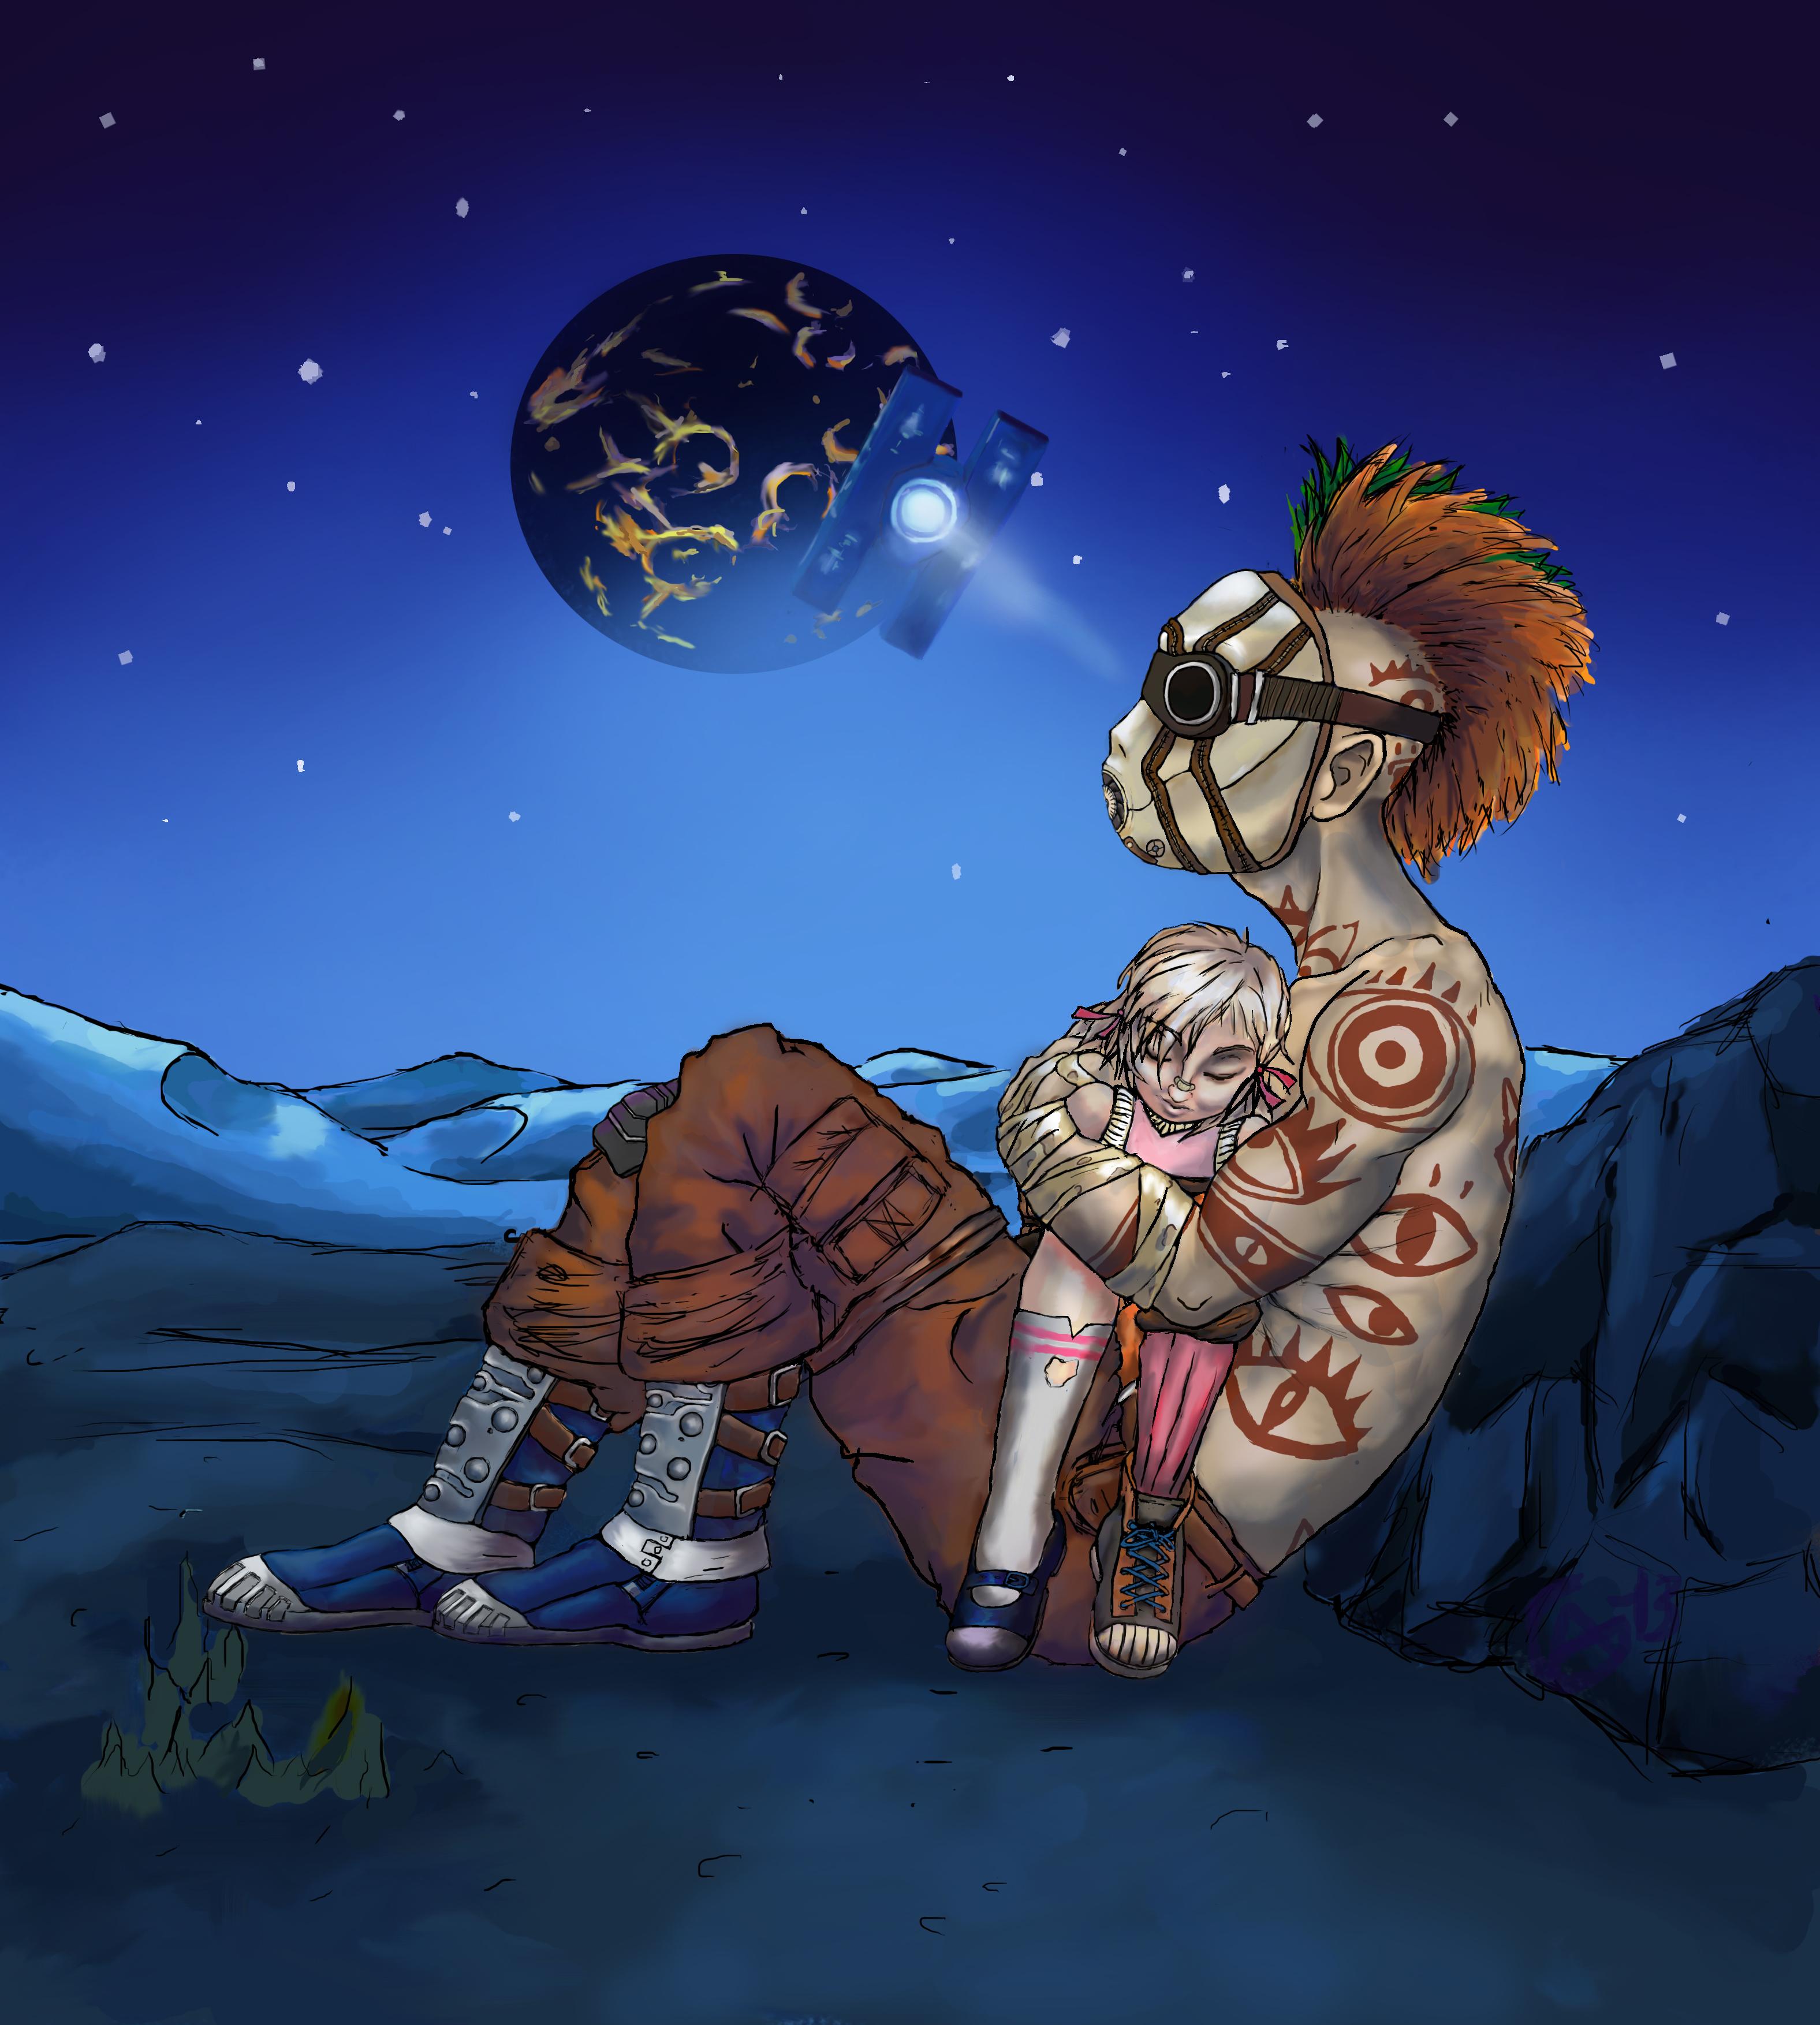 Borderlands Mr. Stick and Tiny Tina. by AG-sArt on DeviantArt